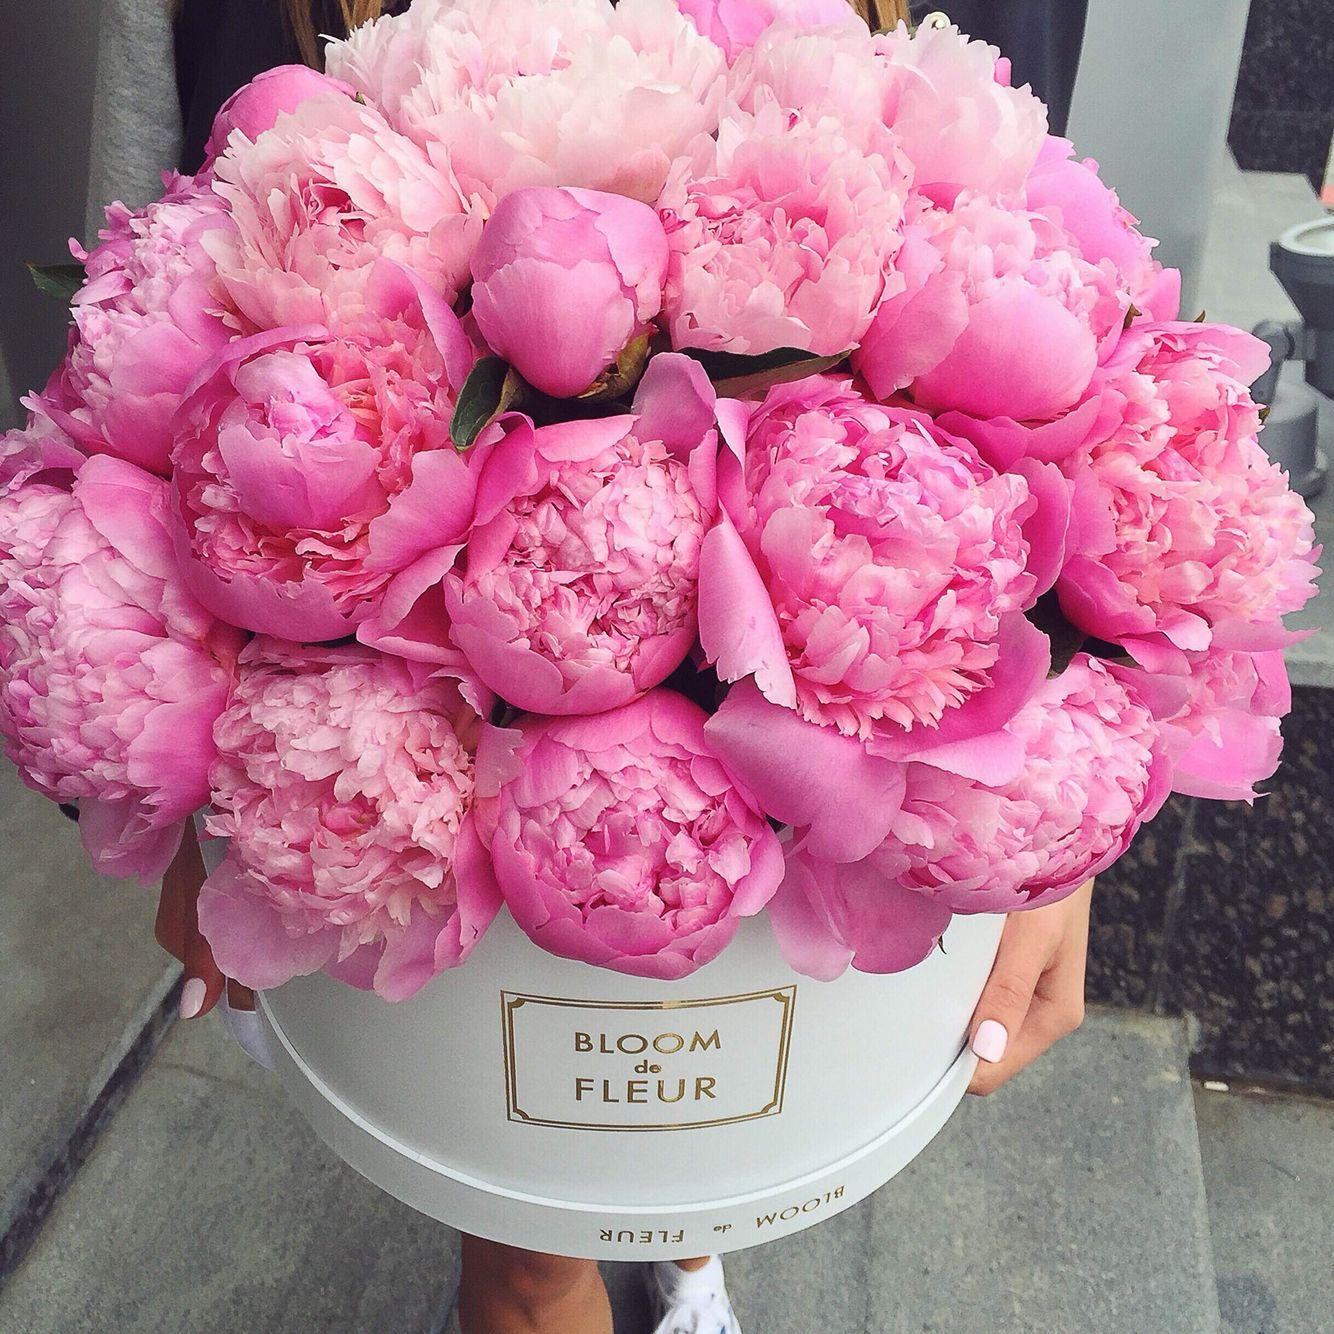 Flower Roses Pinterest: Look At These Peonies! Just Look!